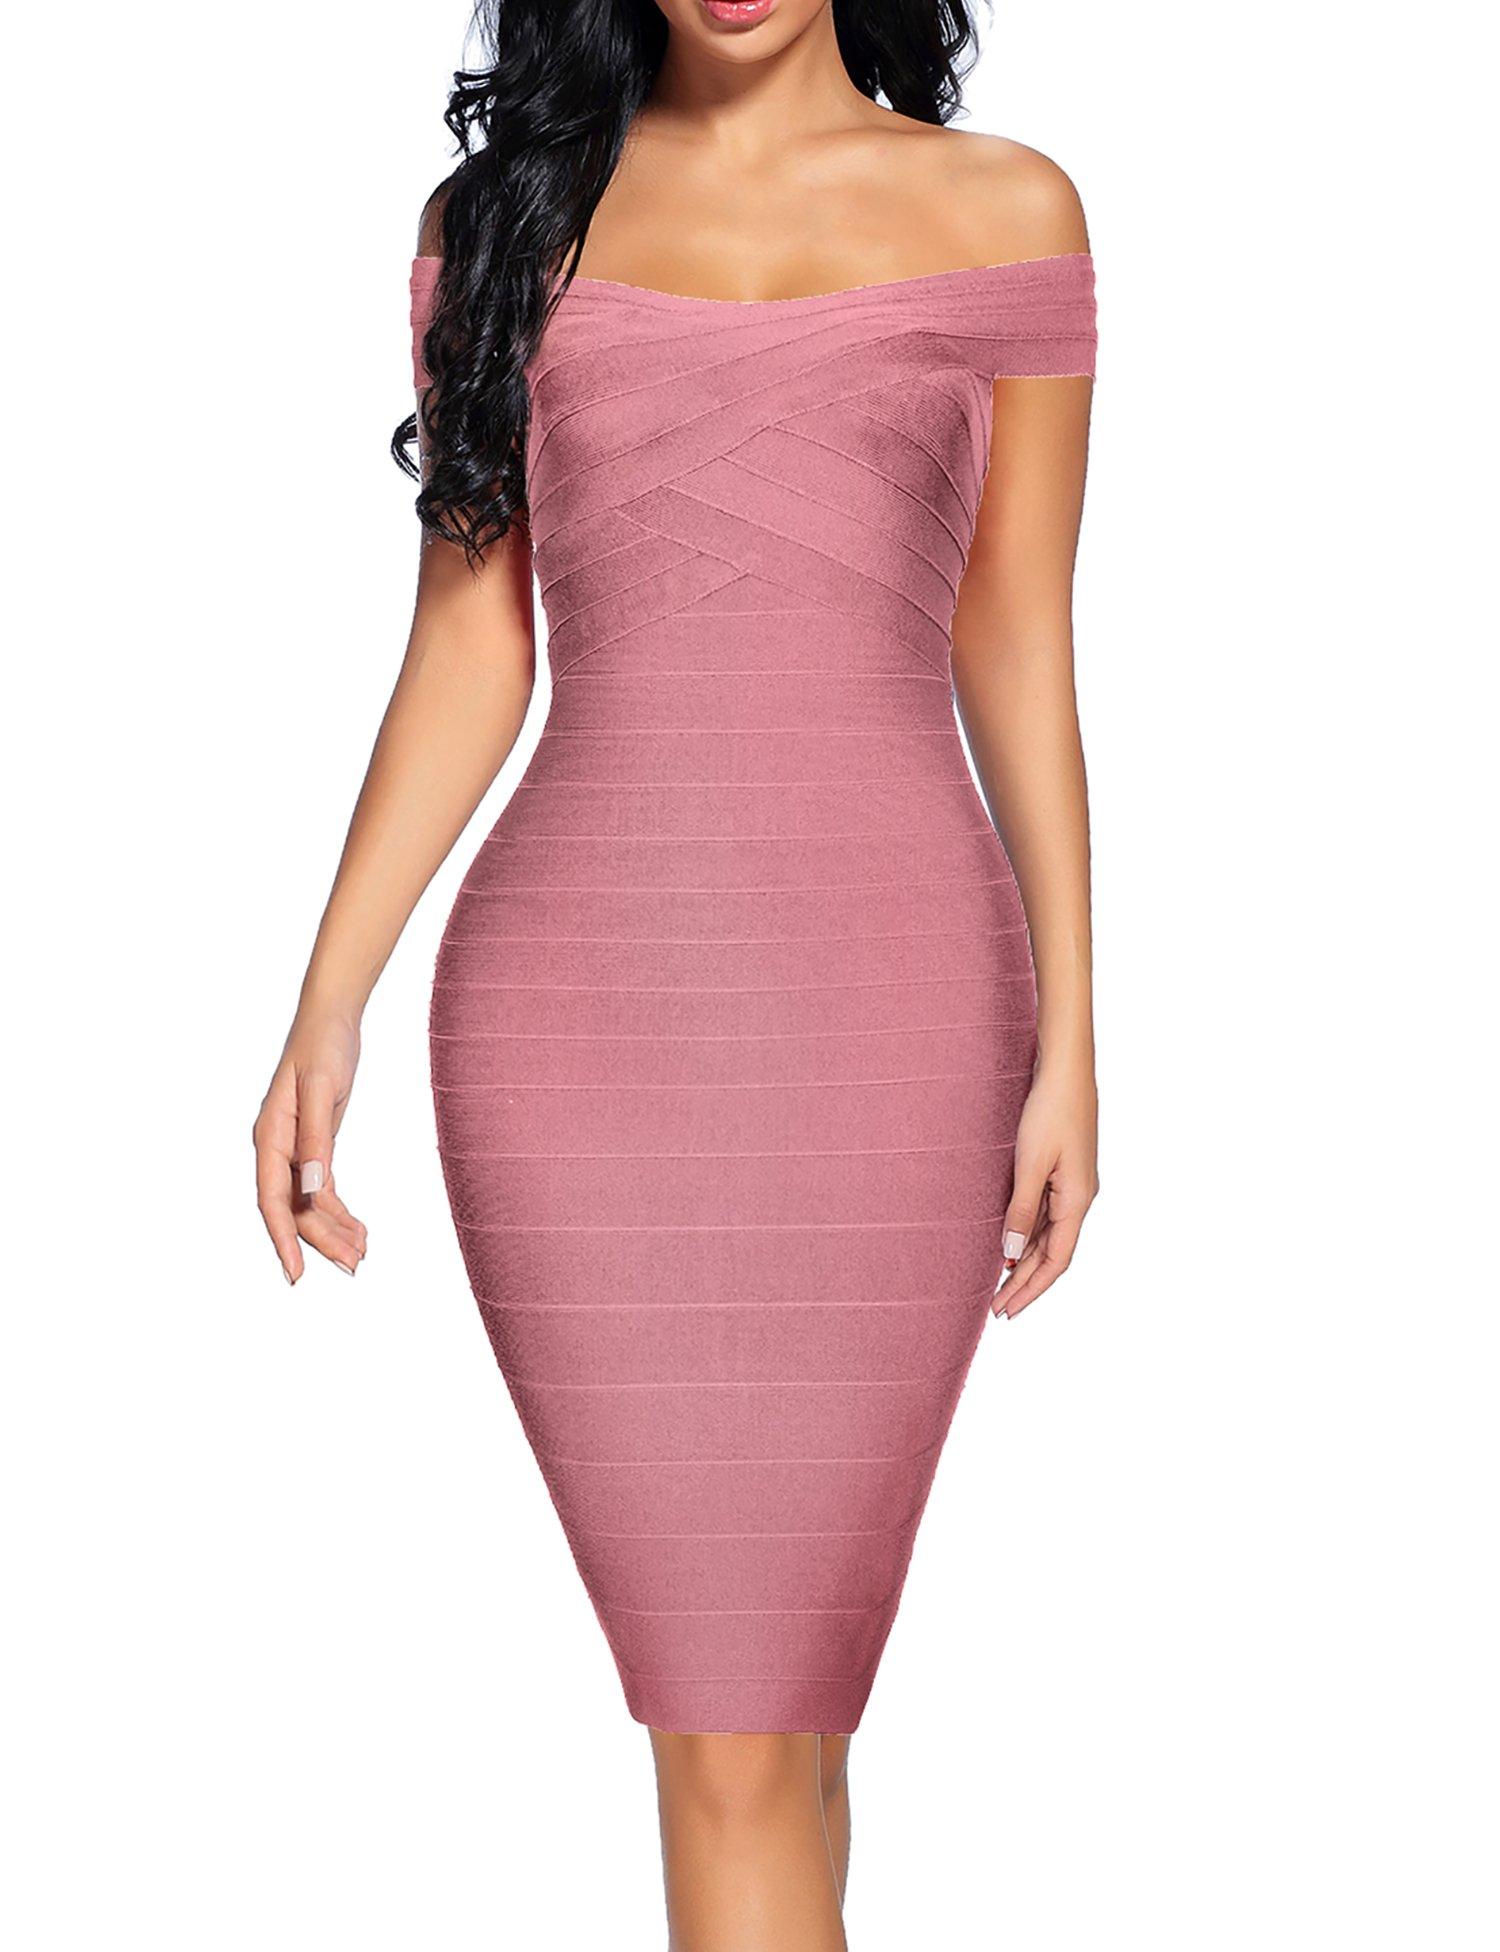 houstil Women's Off Shoulder Spaghetti Bandage Bodycon Dress Party (M, Pink)